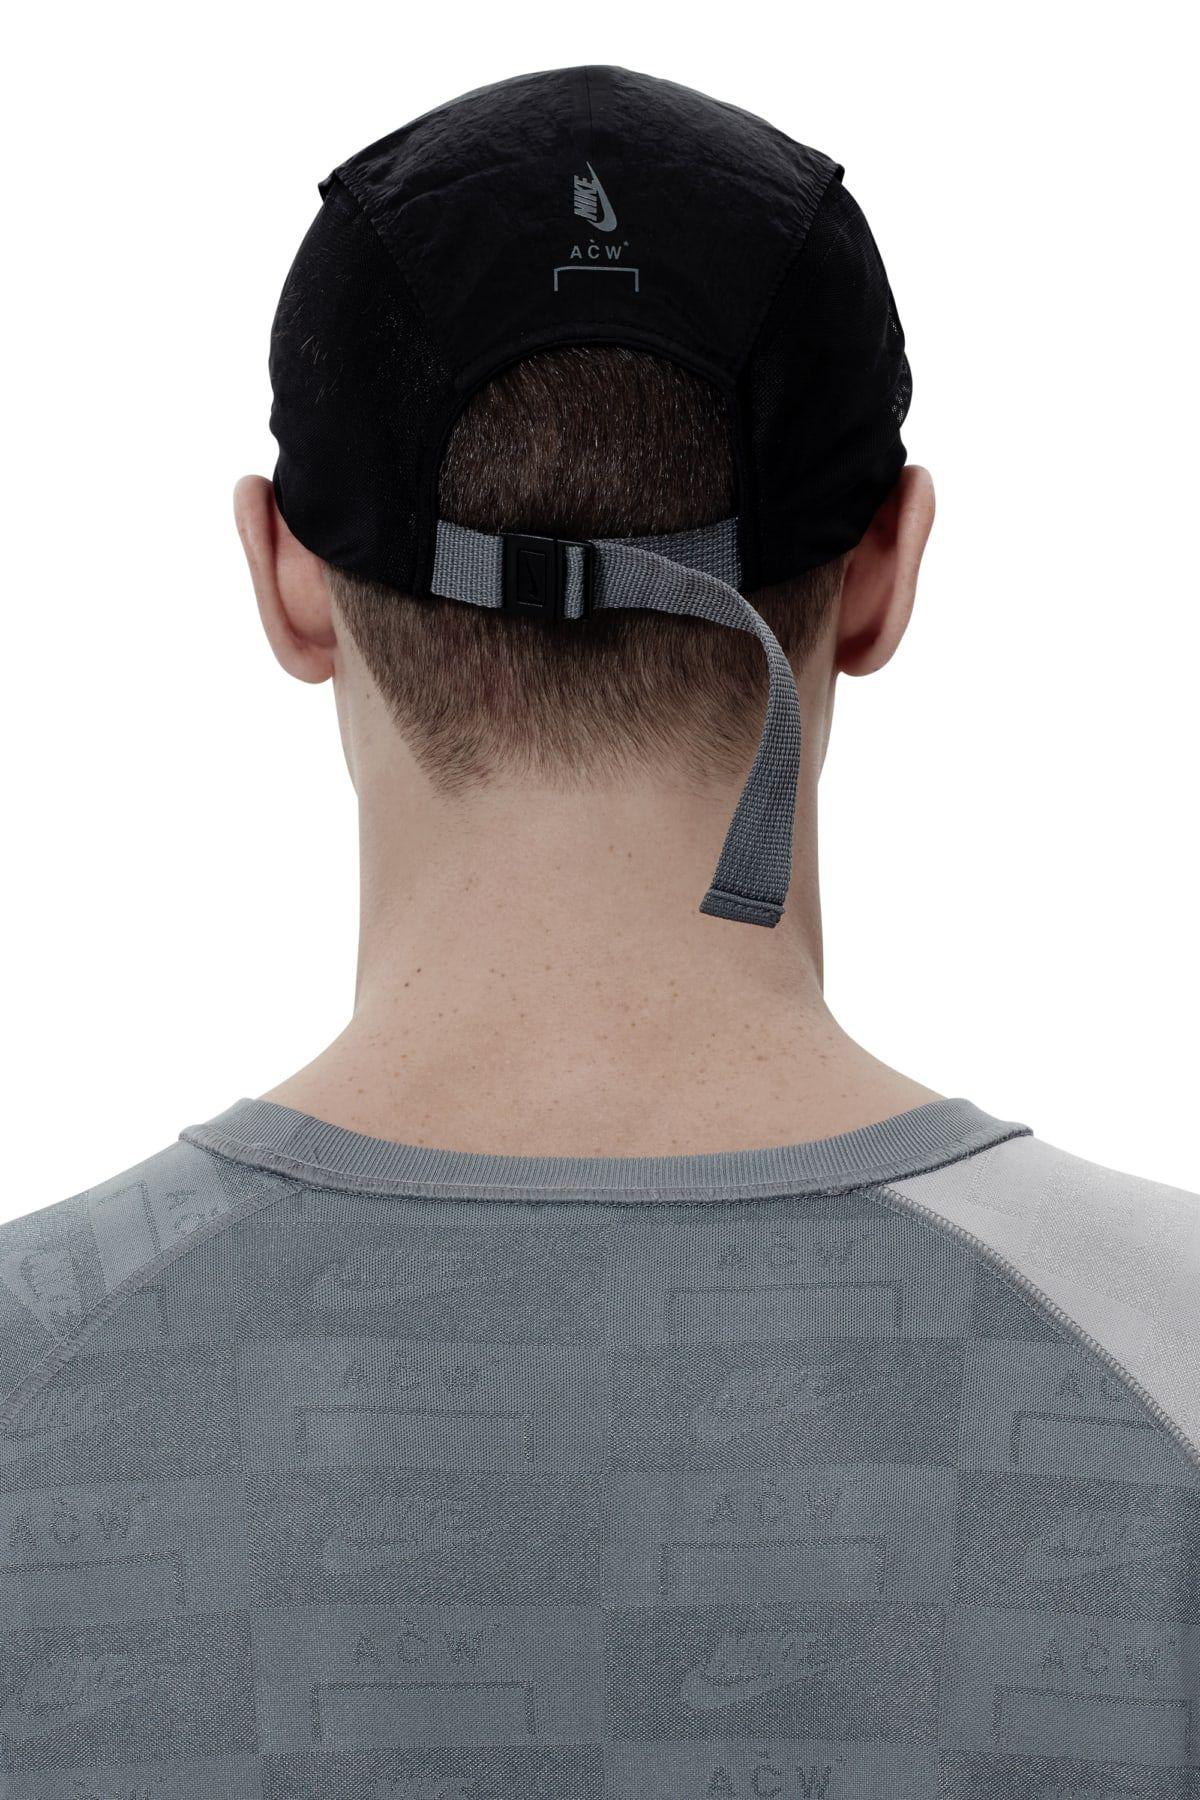 013424750 Nike x ACW  - Onyx Technical Dual Nylon Cap - A-COLD-WALL